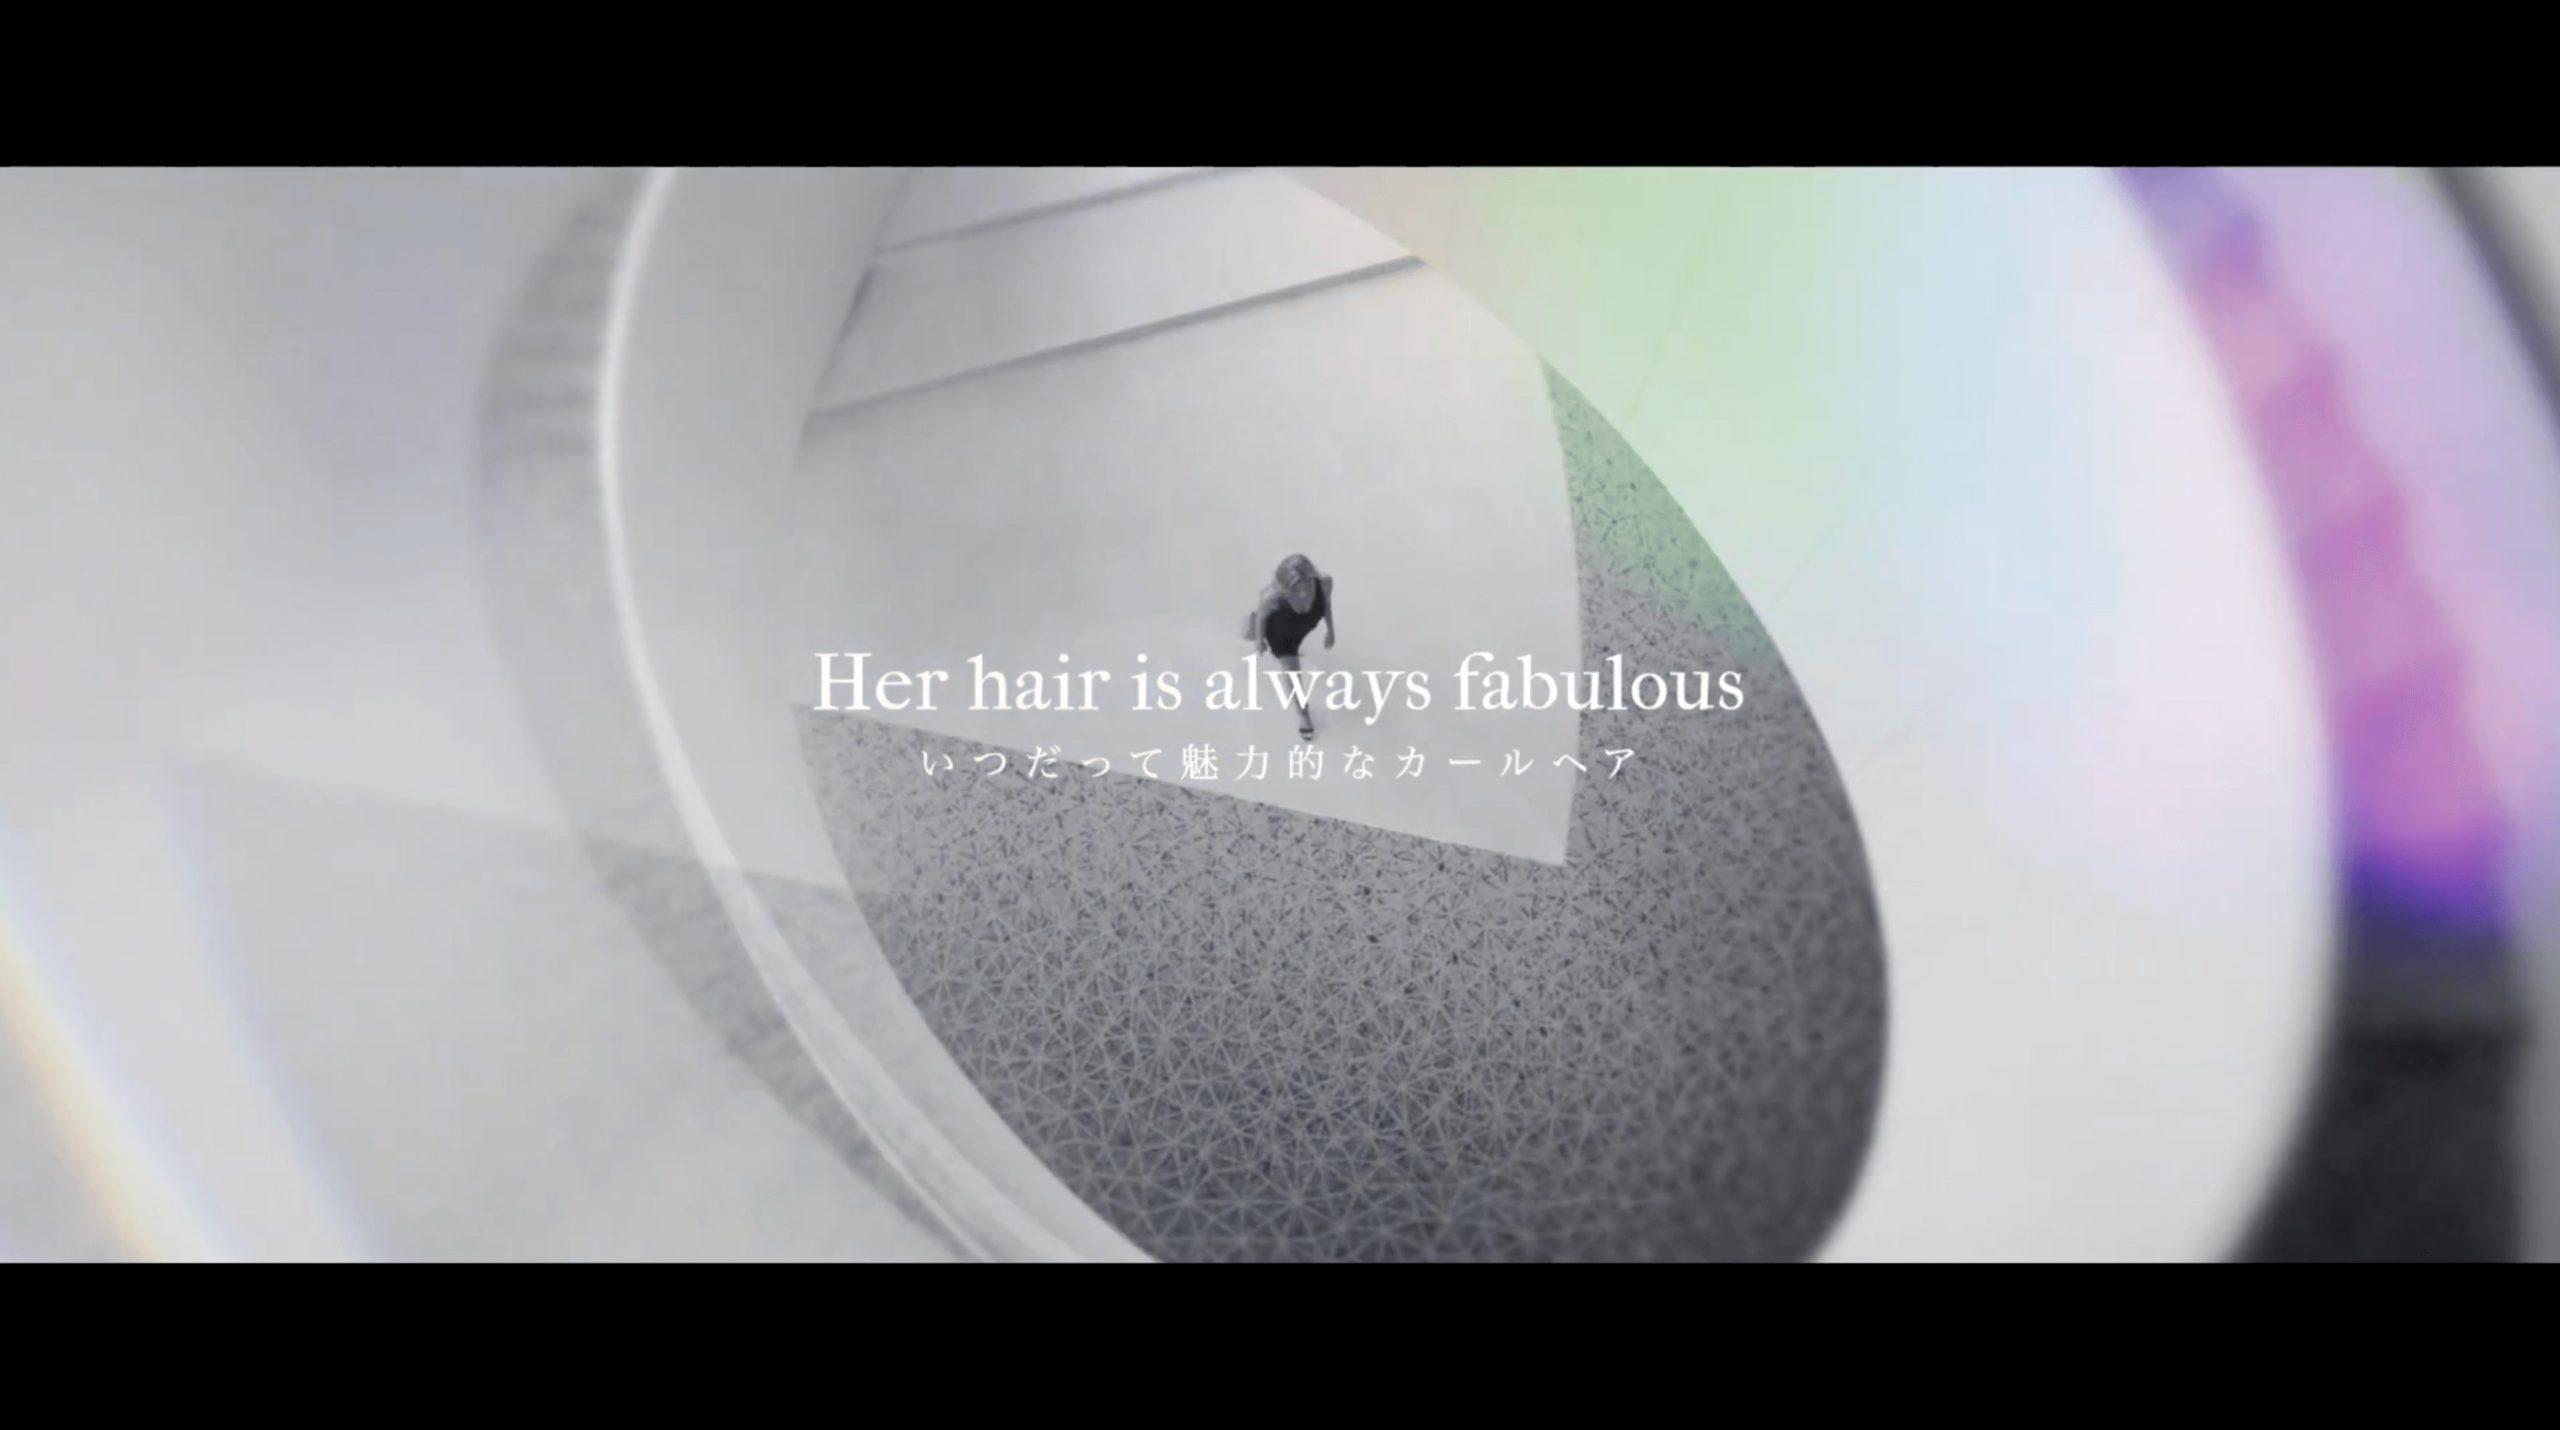 【PV】Anela Beauty By HOLISTIC Cures ポータブルカールアイロン